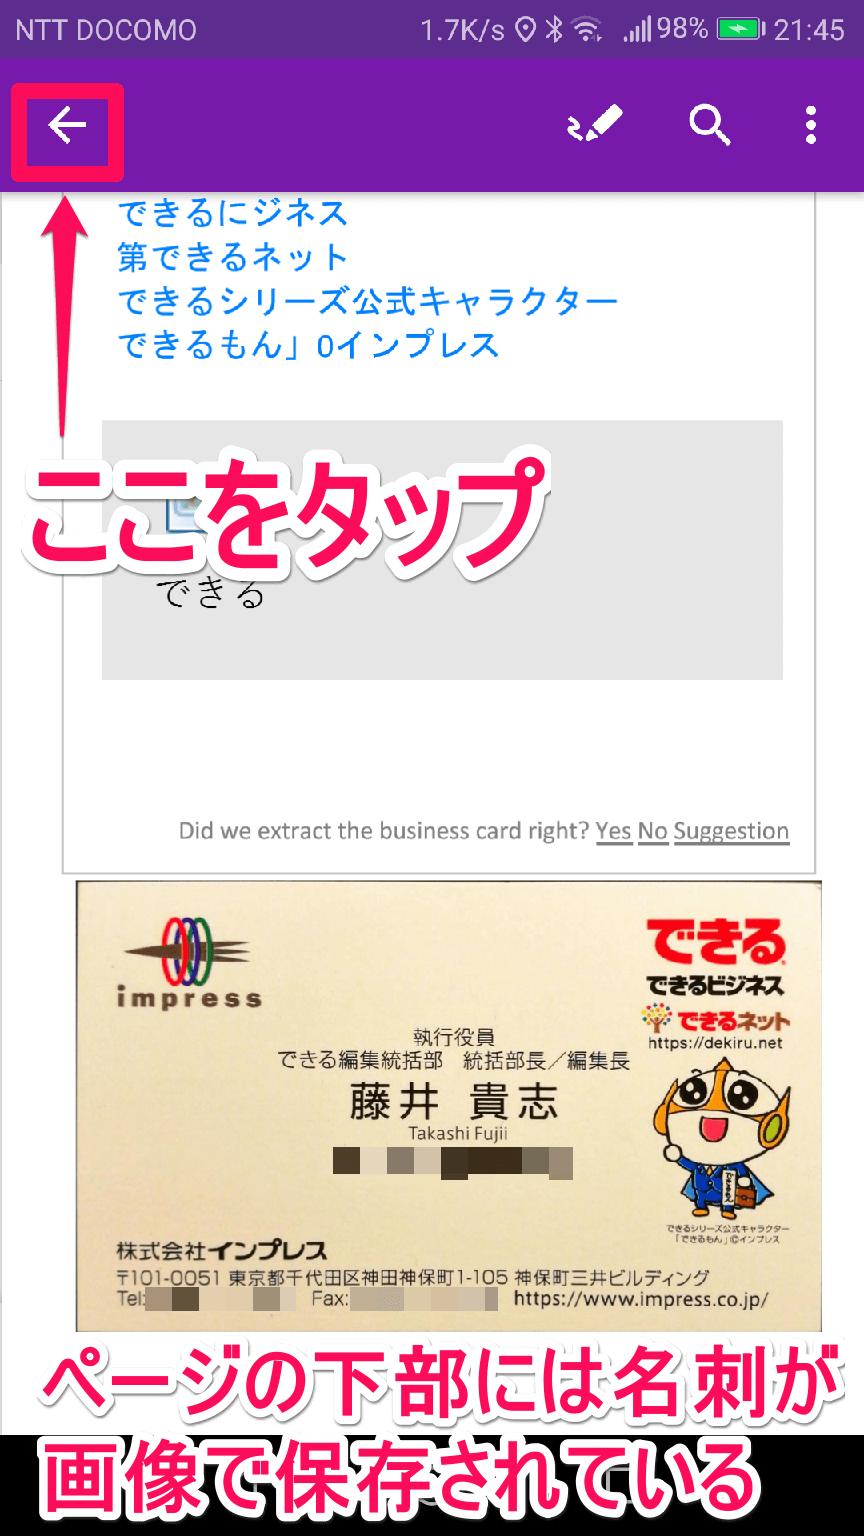 OneNote(ワンノート)アプリで表示された名刺の写真